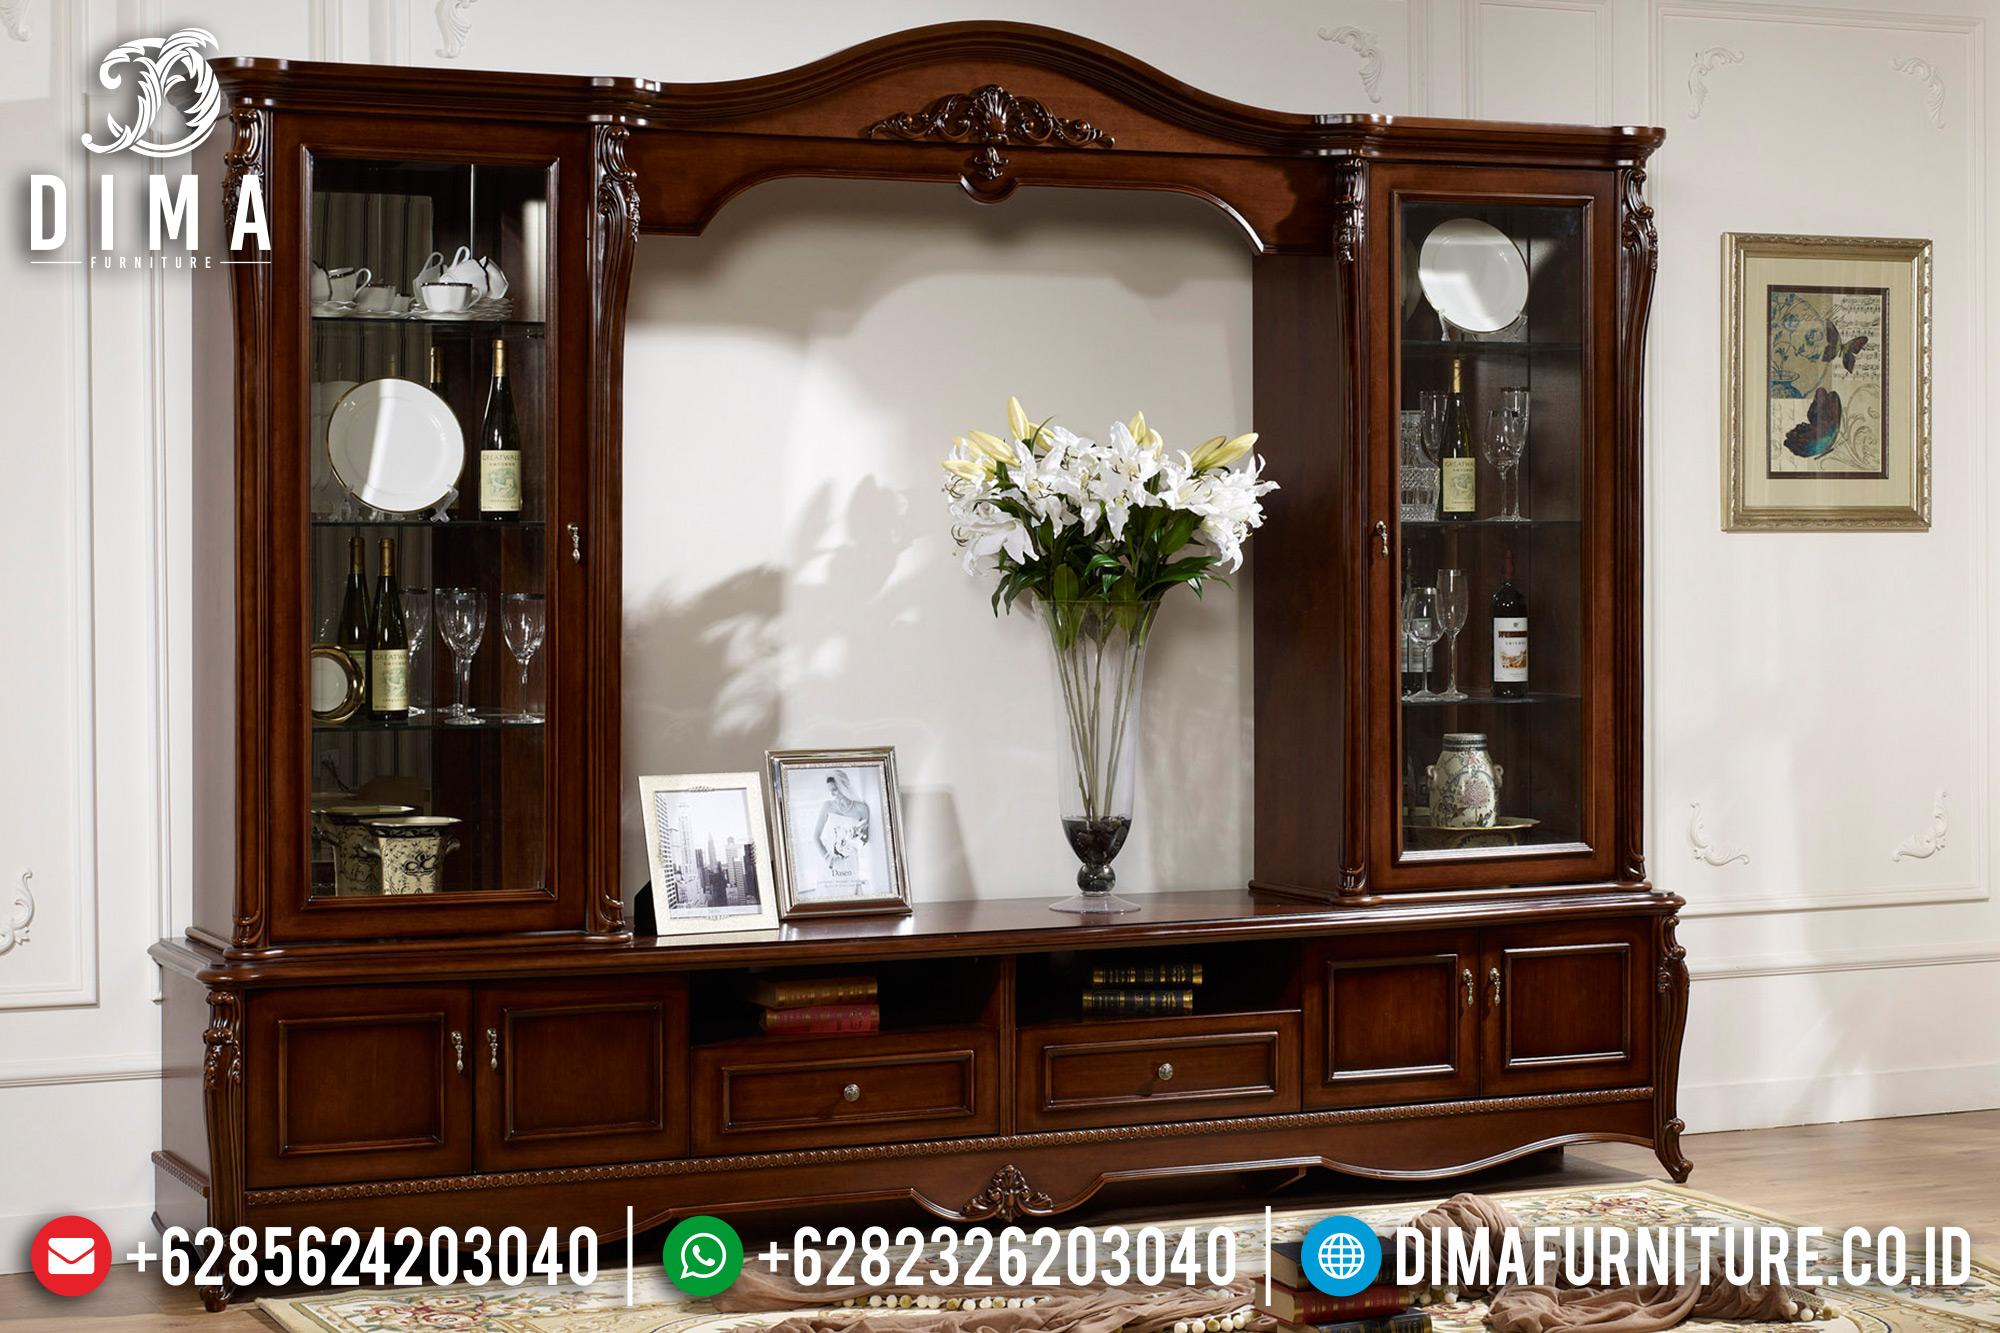 Model Bufet TV Jepara Minimalis Mewah Jati 2019 BT-0114